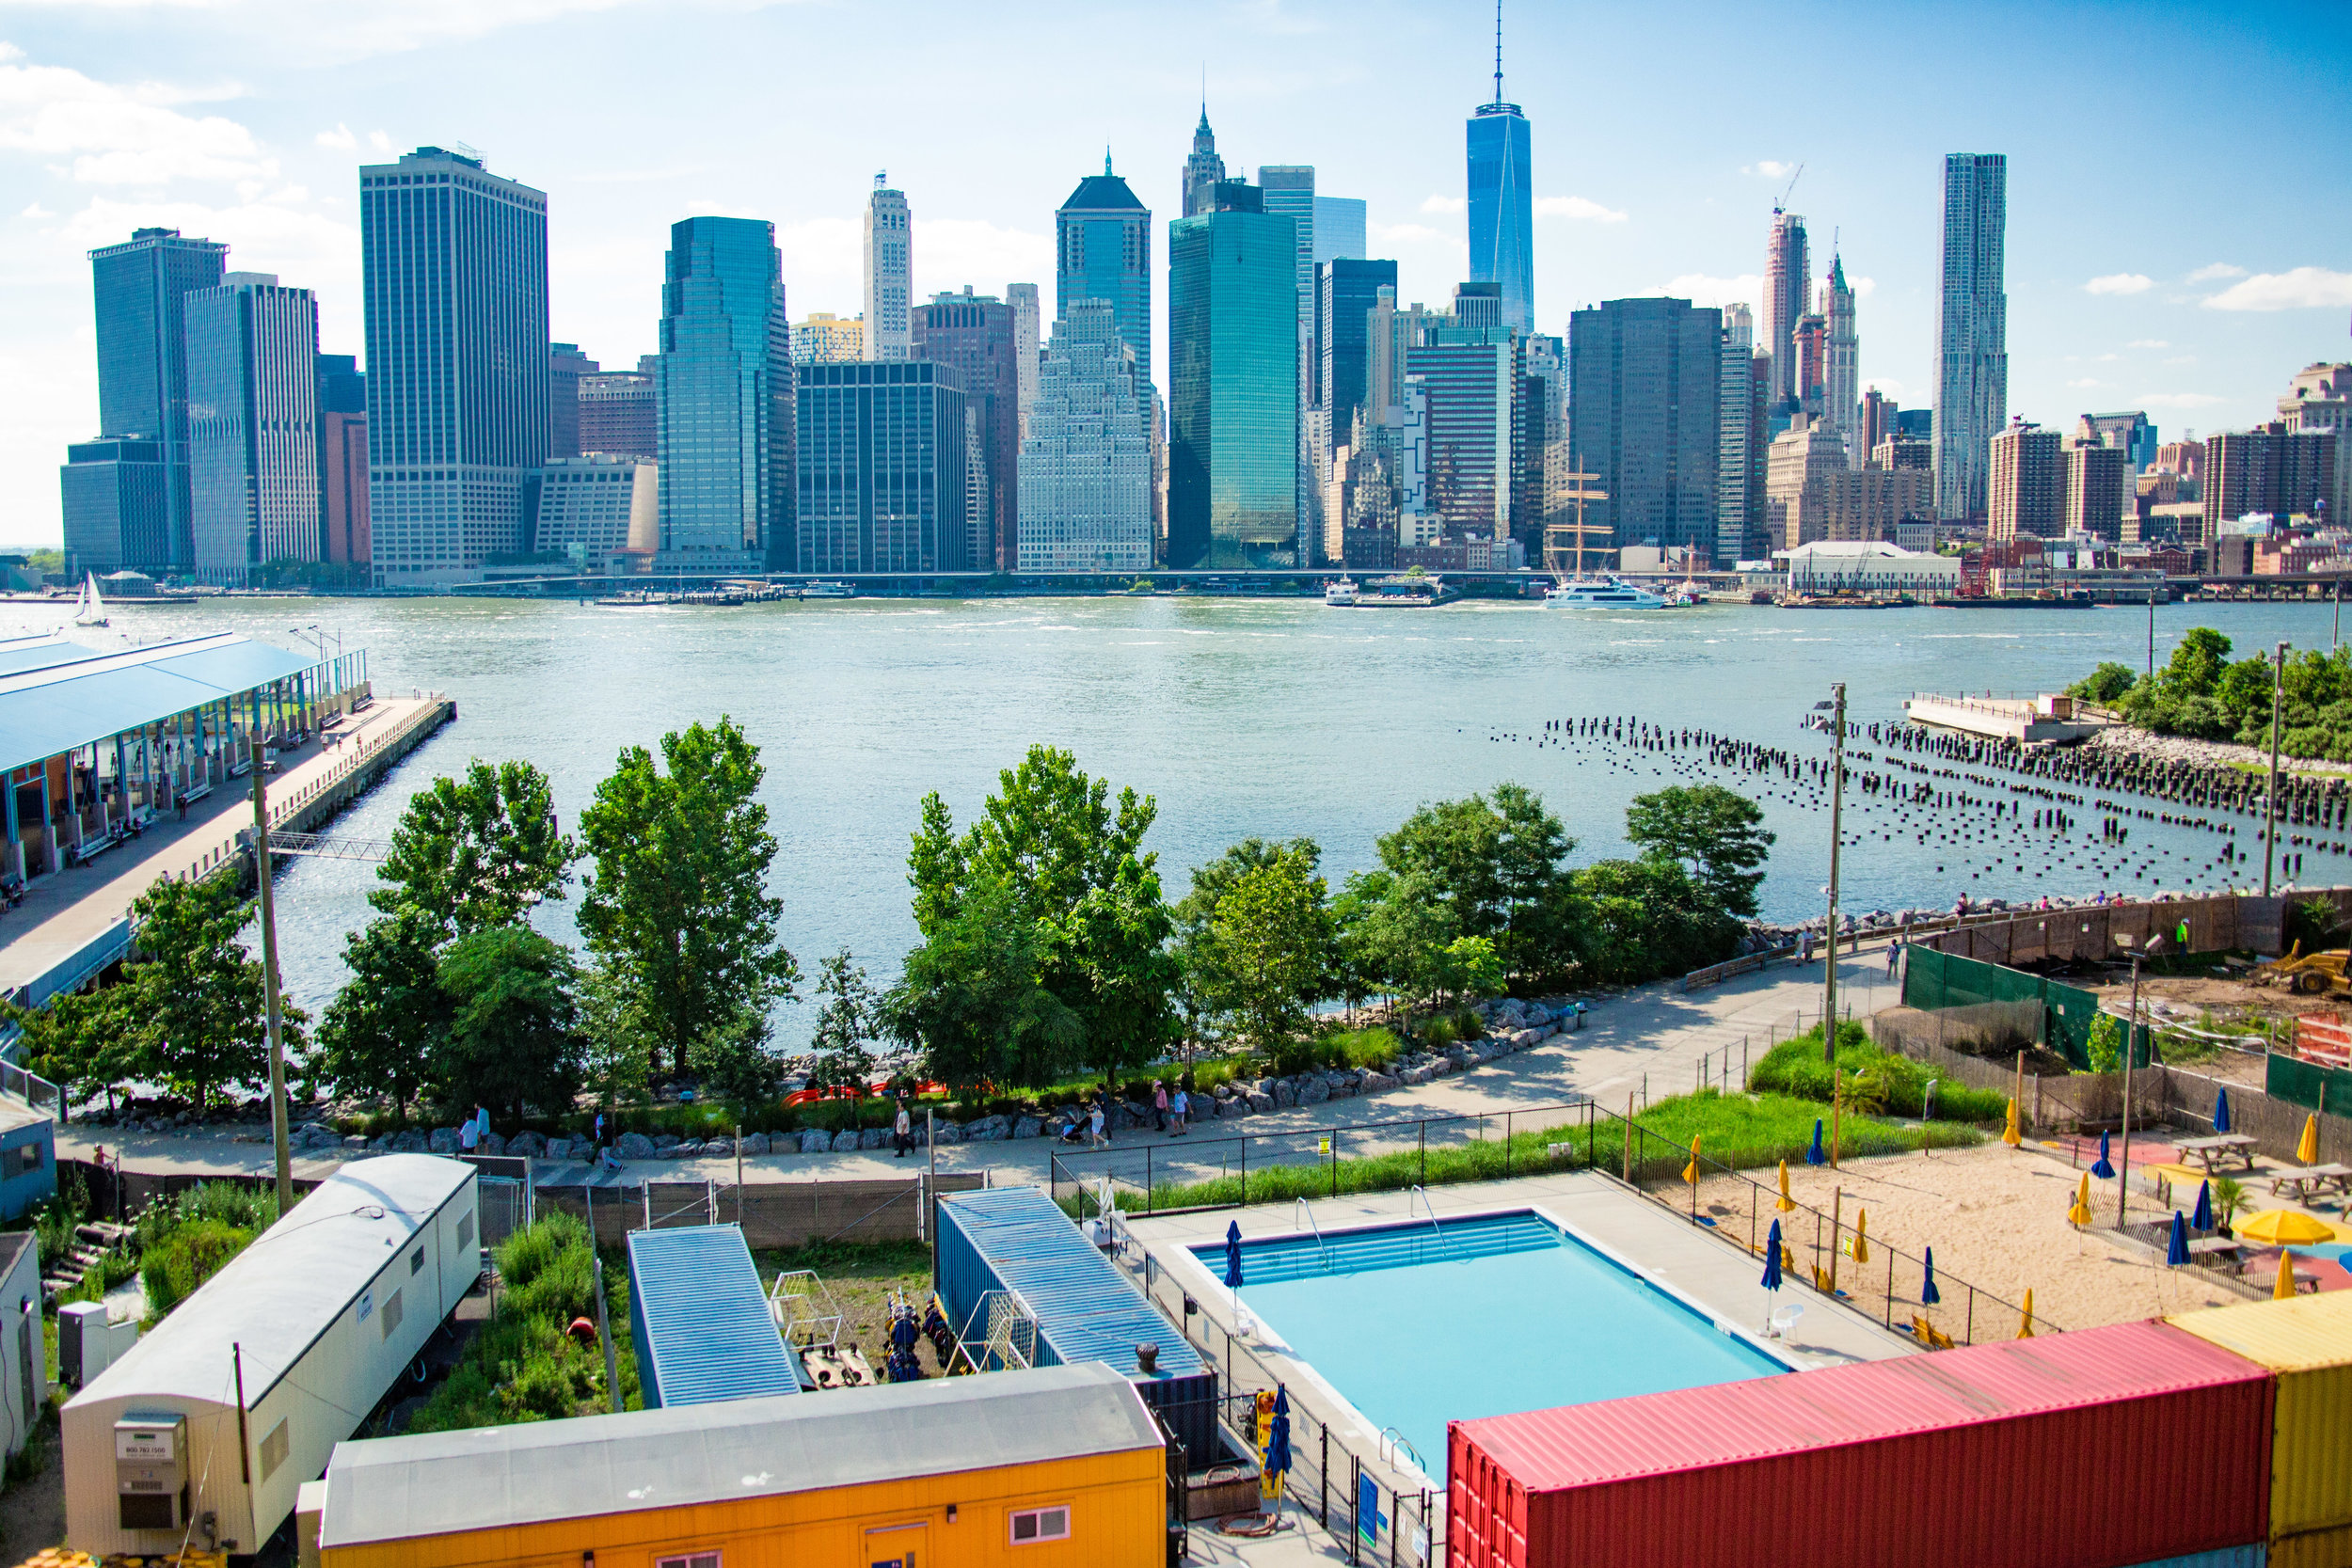 LSNY_Brooklyn_Bridge_Park-80.jpg